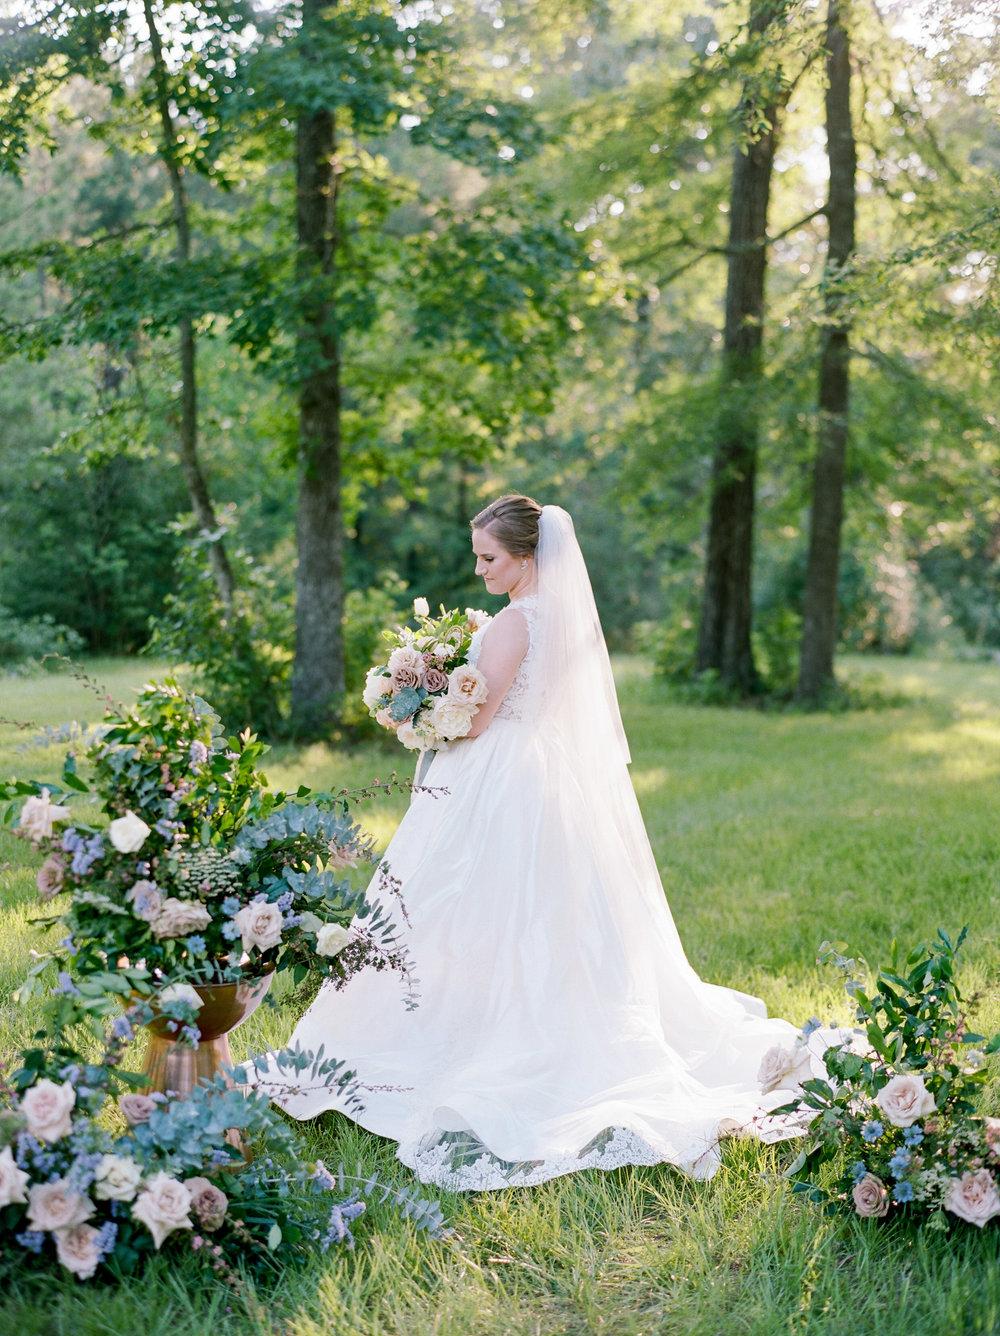 Houston-Fine-Art-Film-Destination-Wedding-Photographer-Top-Best-Luxury-Josh-Dana-Fernandez-Photographer-Austin-Texas-17.jpg